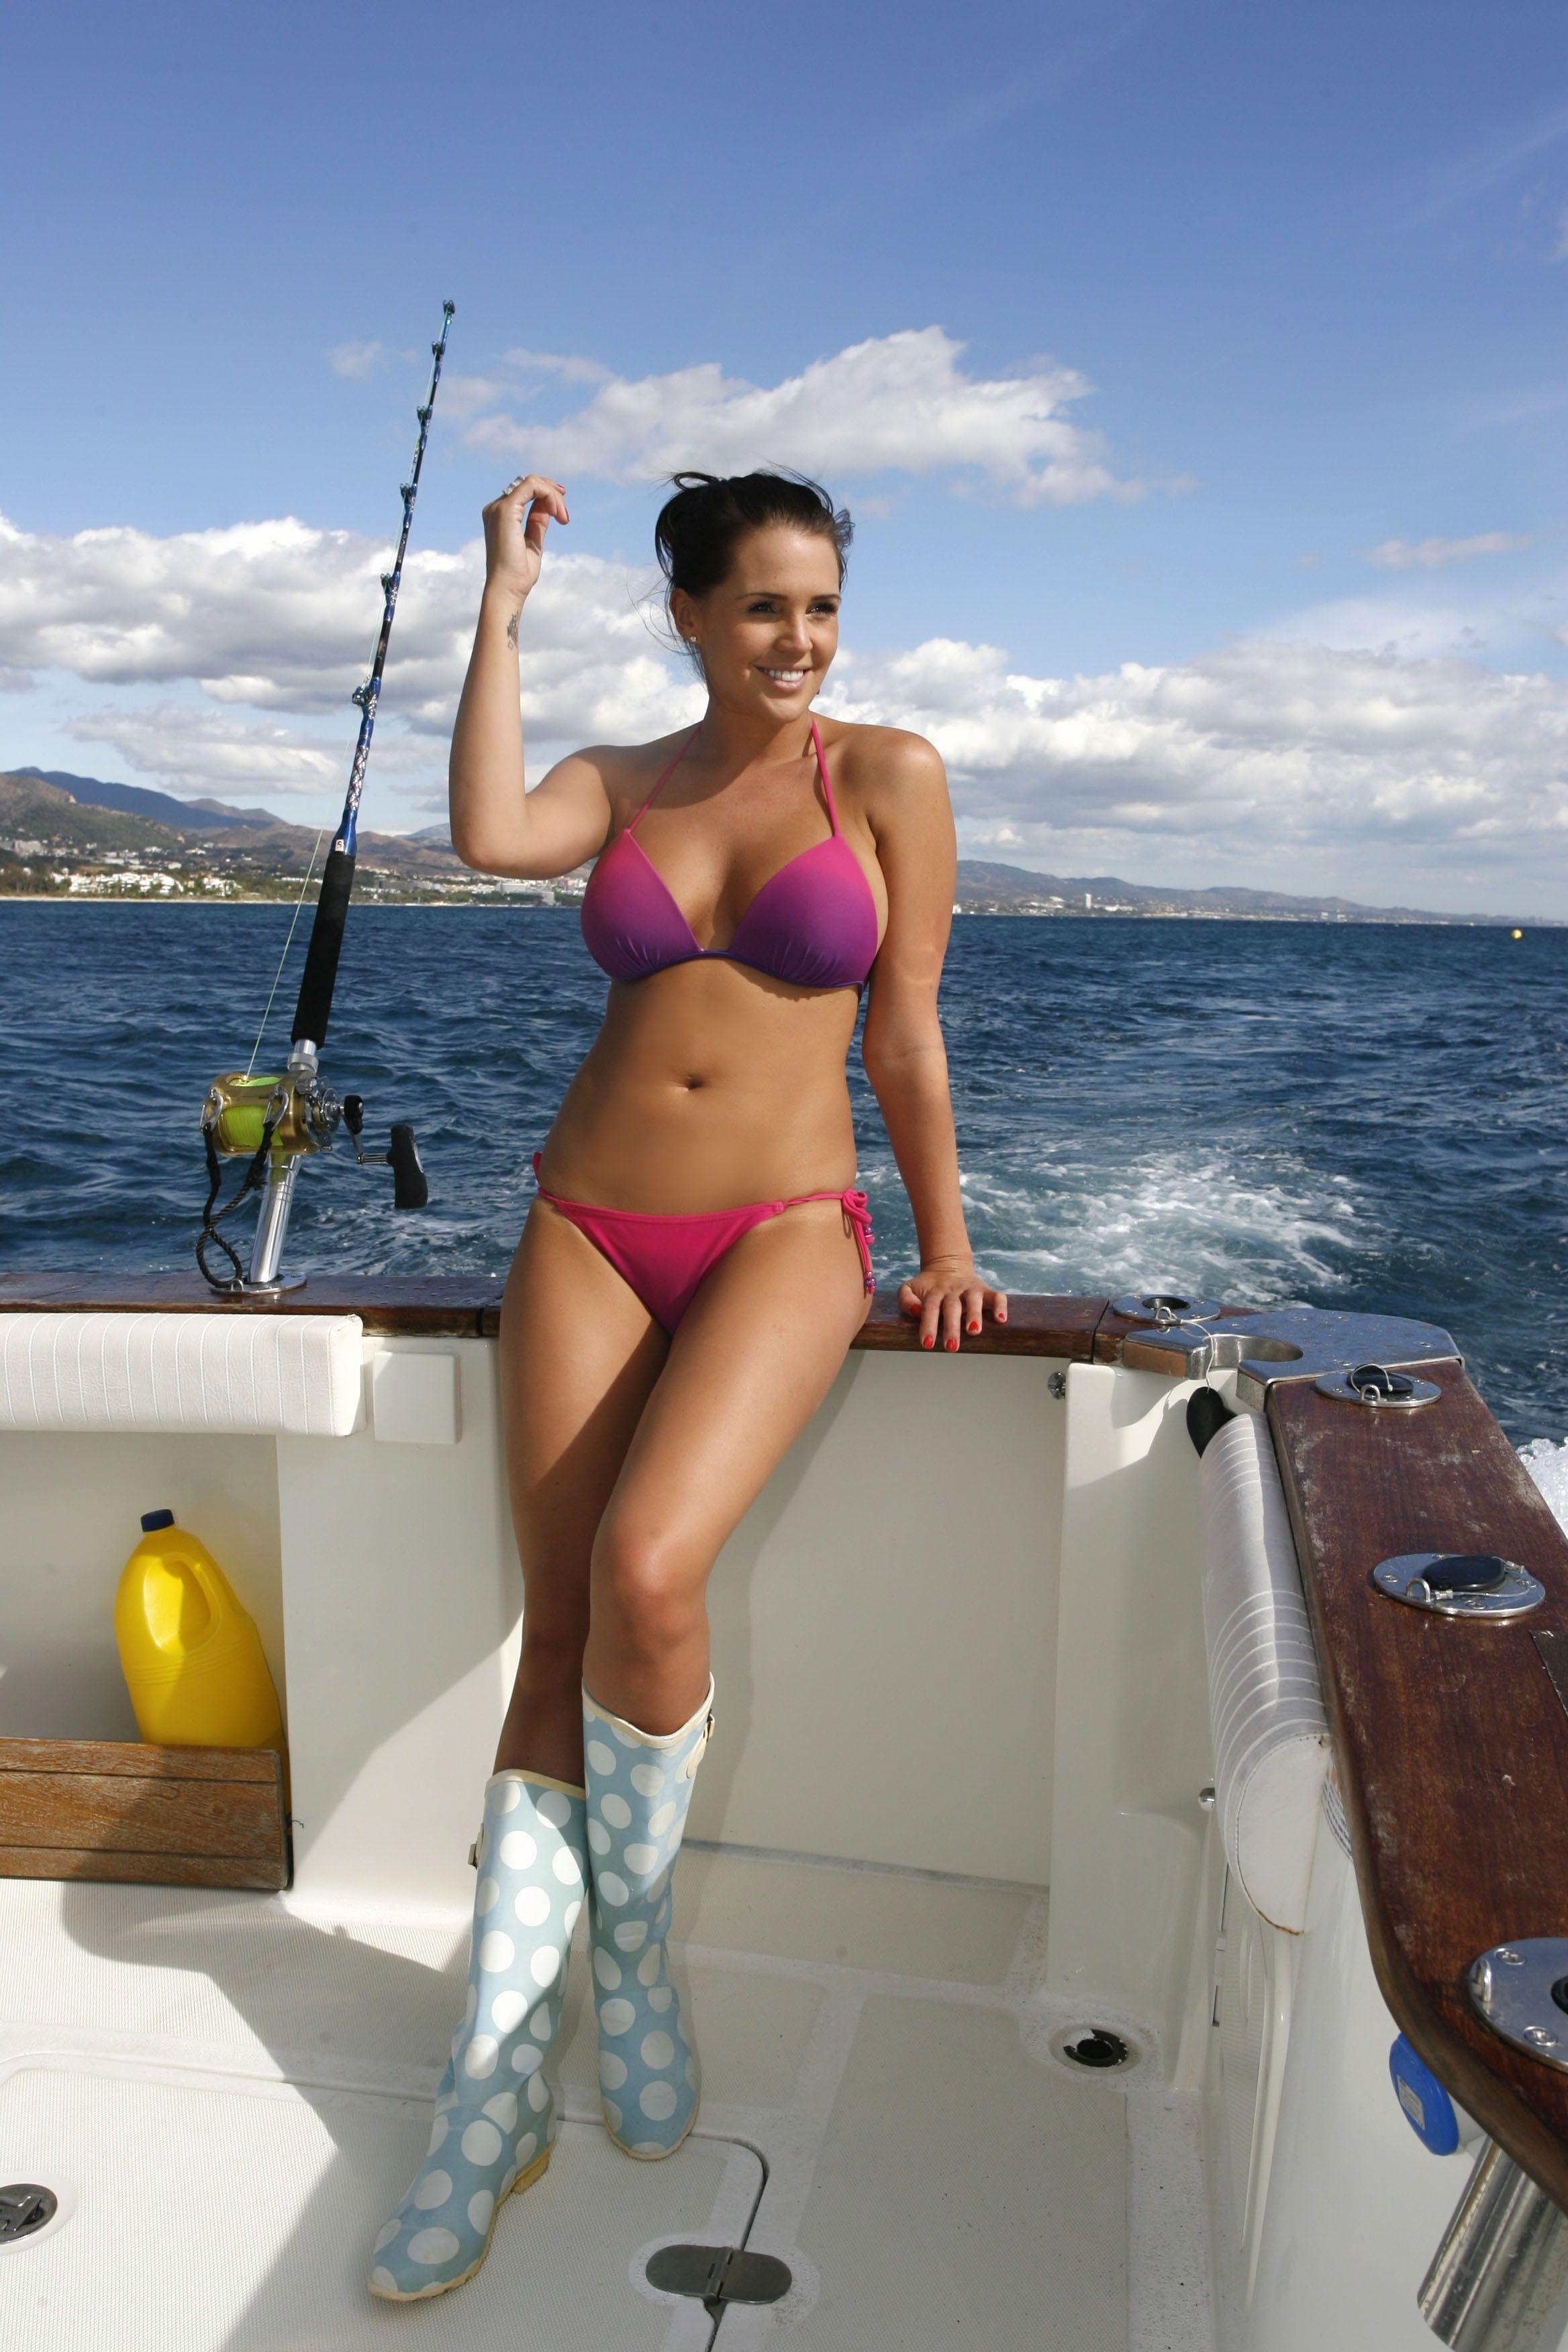 manufacture bikini Boat